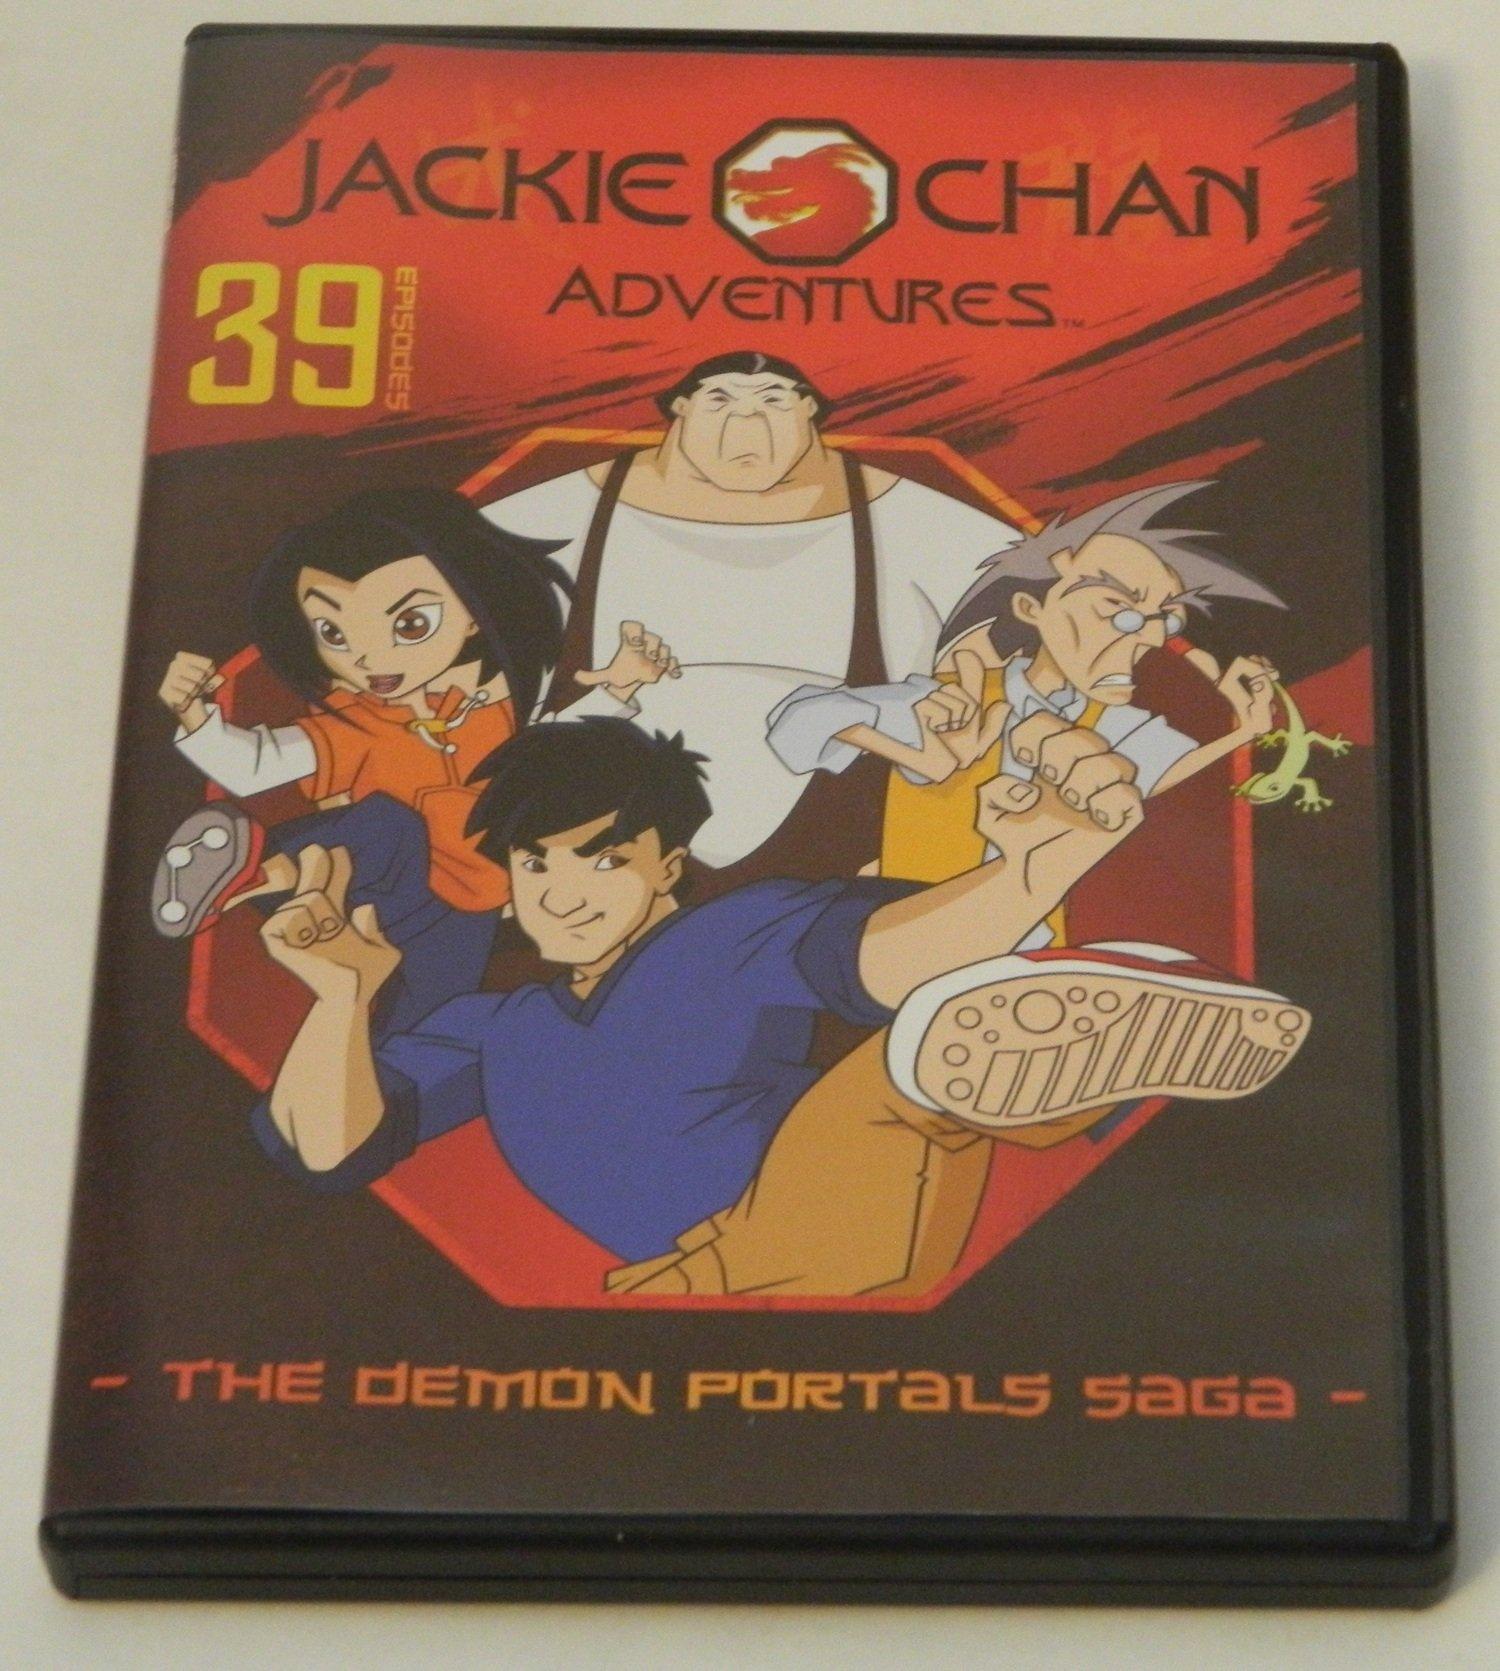 Jackie Chan Adventures The Demon Portals Saga DVD